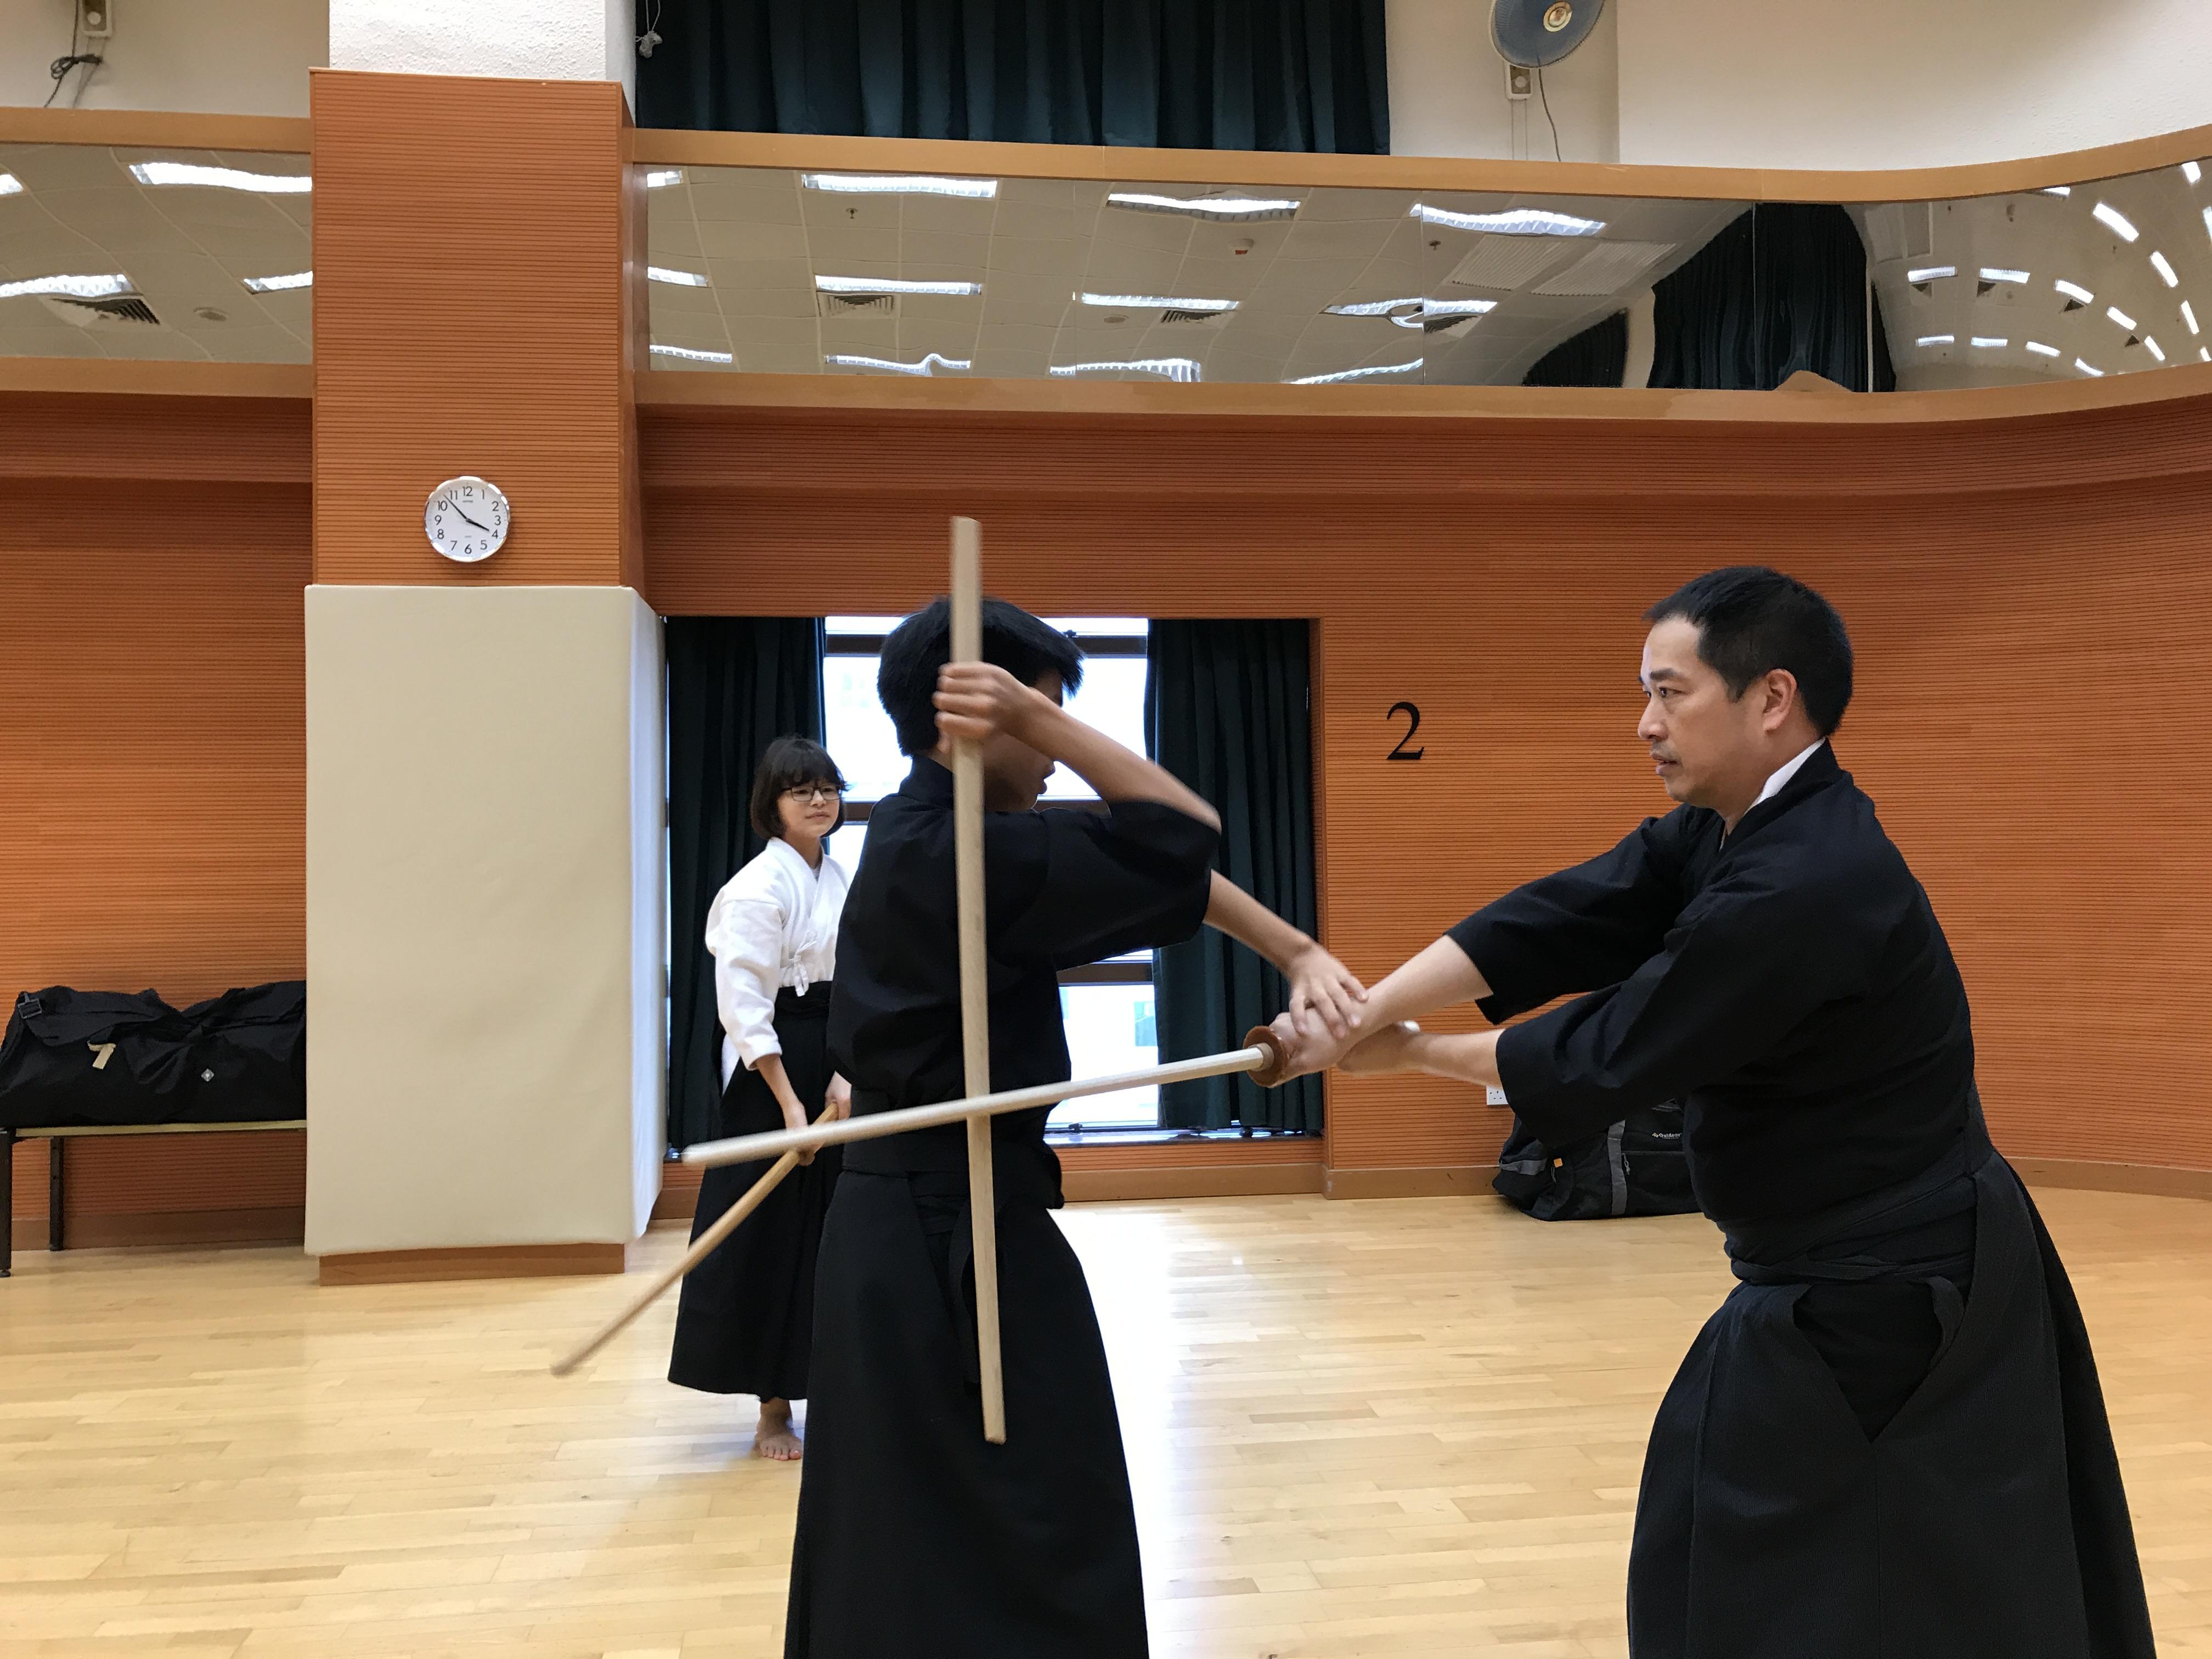 Musokan Hong Kong 無双館 香港道場 少年部